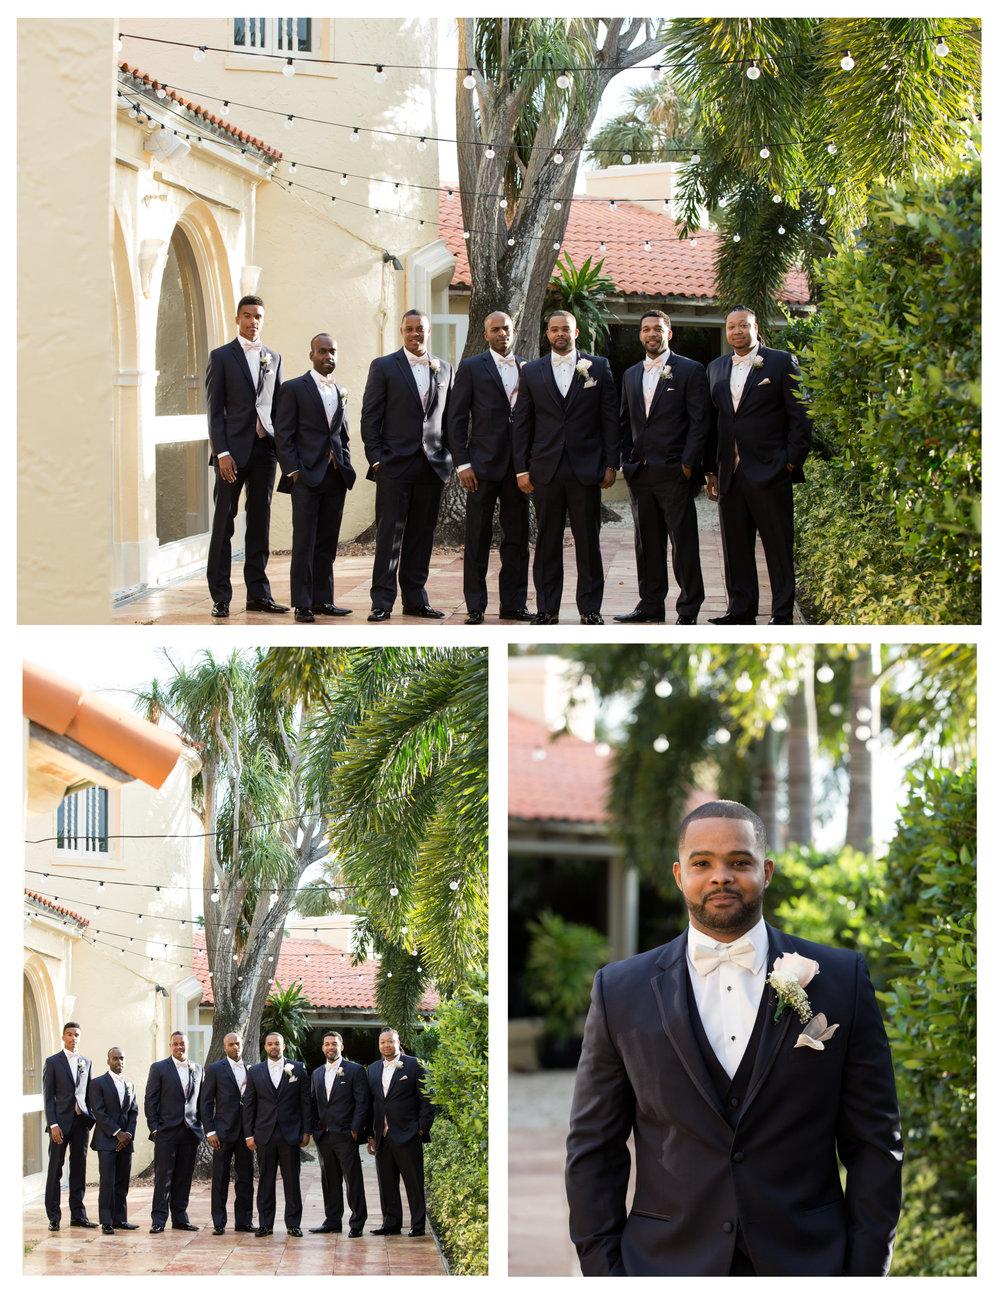 Benvenuto_wedding_Boynton_Beach_Jodi_Fjelde_Photography_Nikki_Otis_married_8.jpg